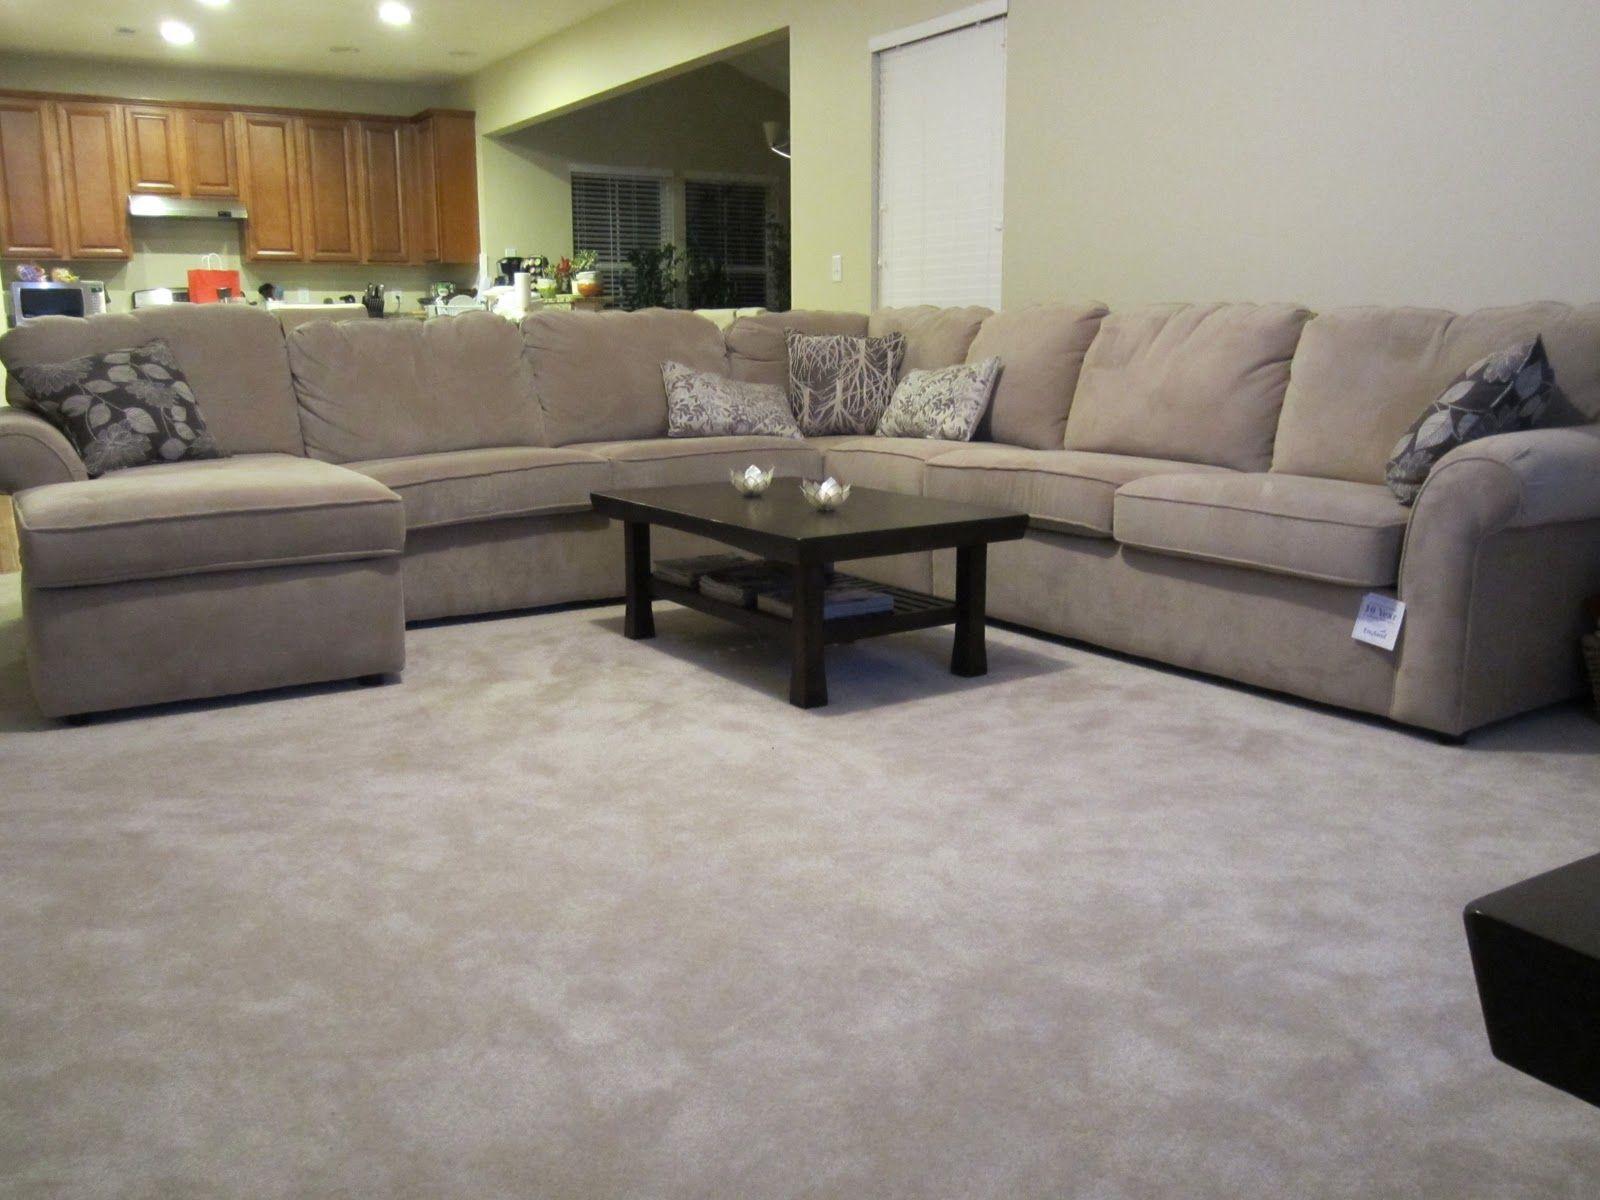 Costco Furniture Sofa Minimalist Modern Ideas in 2020